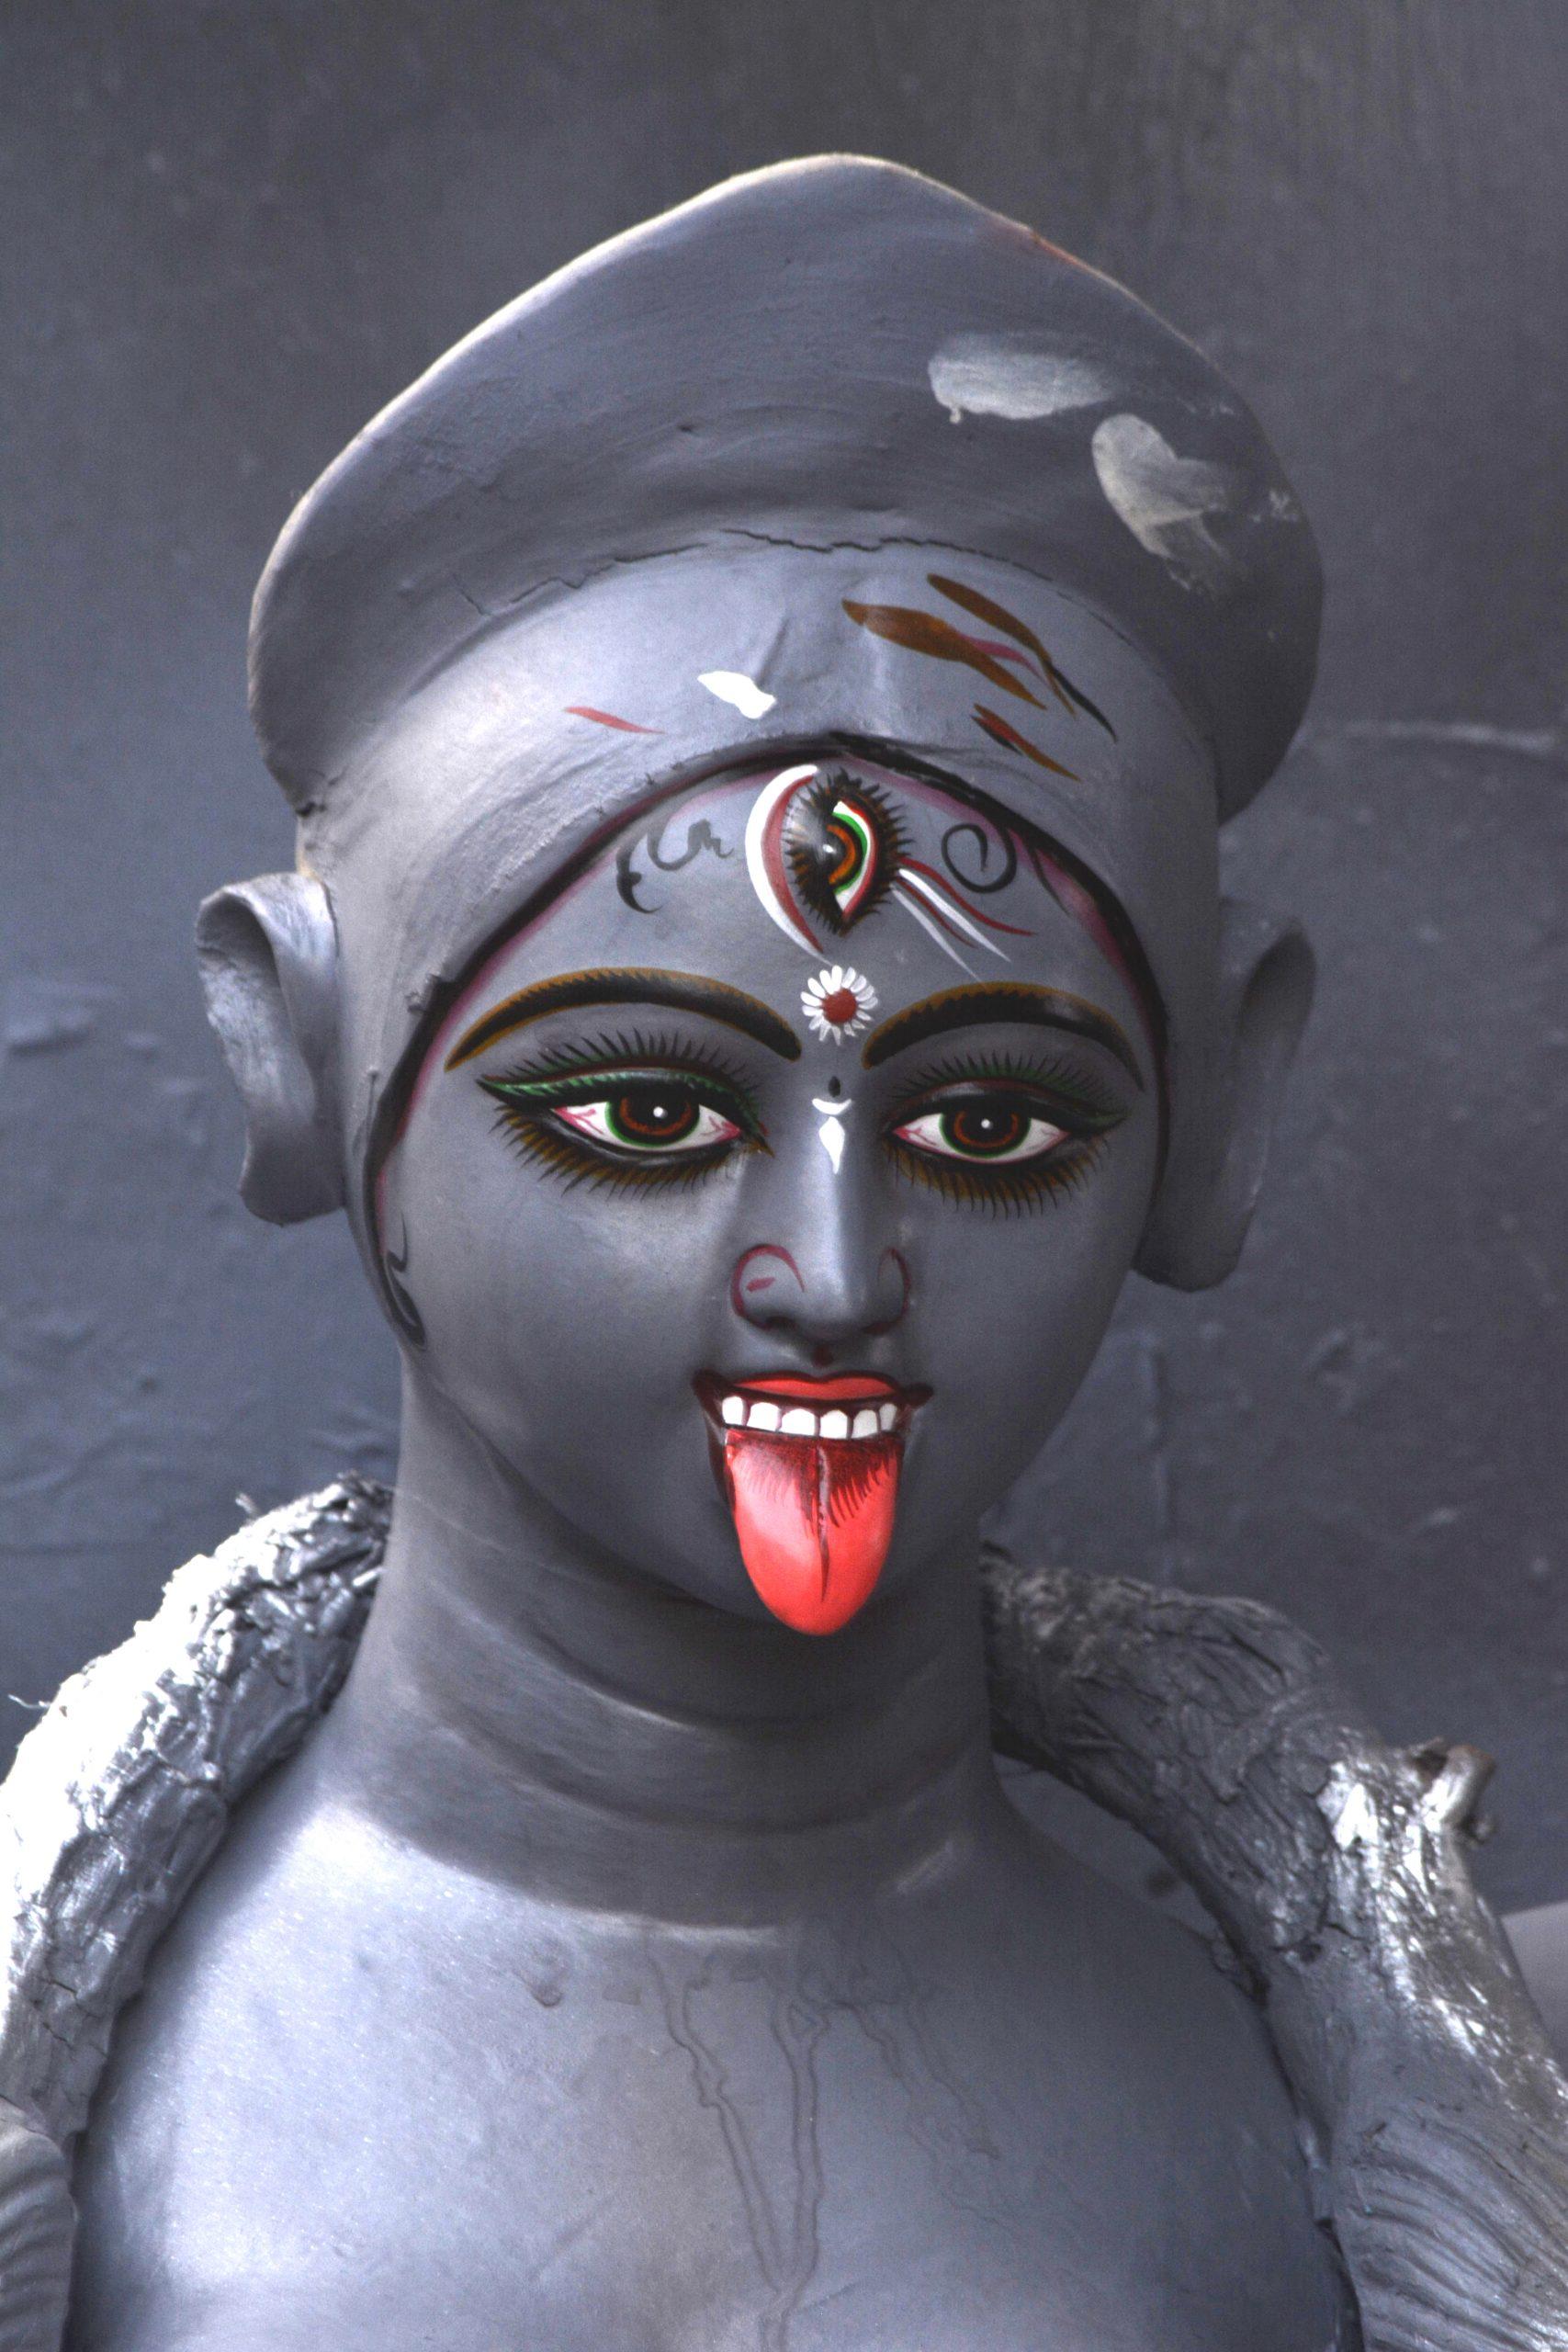 An idol of goddess Kali